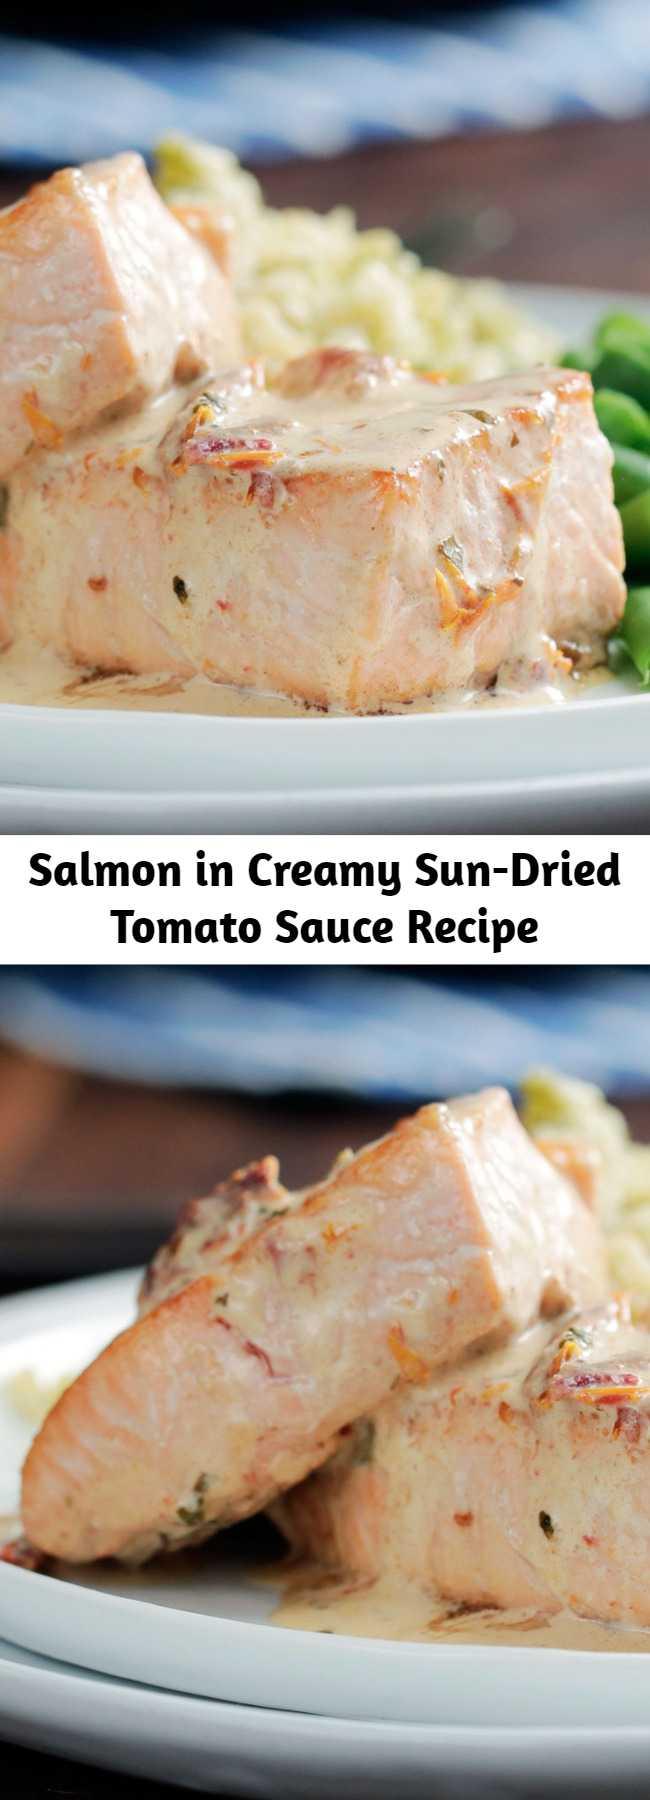 Salmon in Creamy Sun-Dried Tomato Sauce Recipe - Layer on the flavor with a creamy sun-dried tomato sauce over lightly seasoned sauteed salmon.